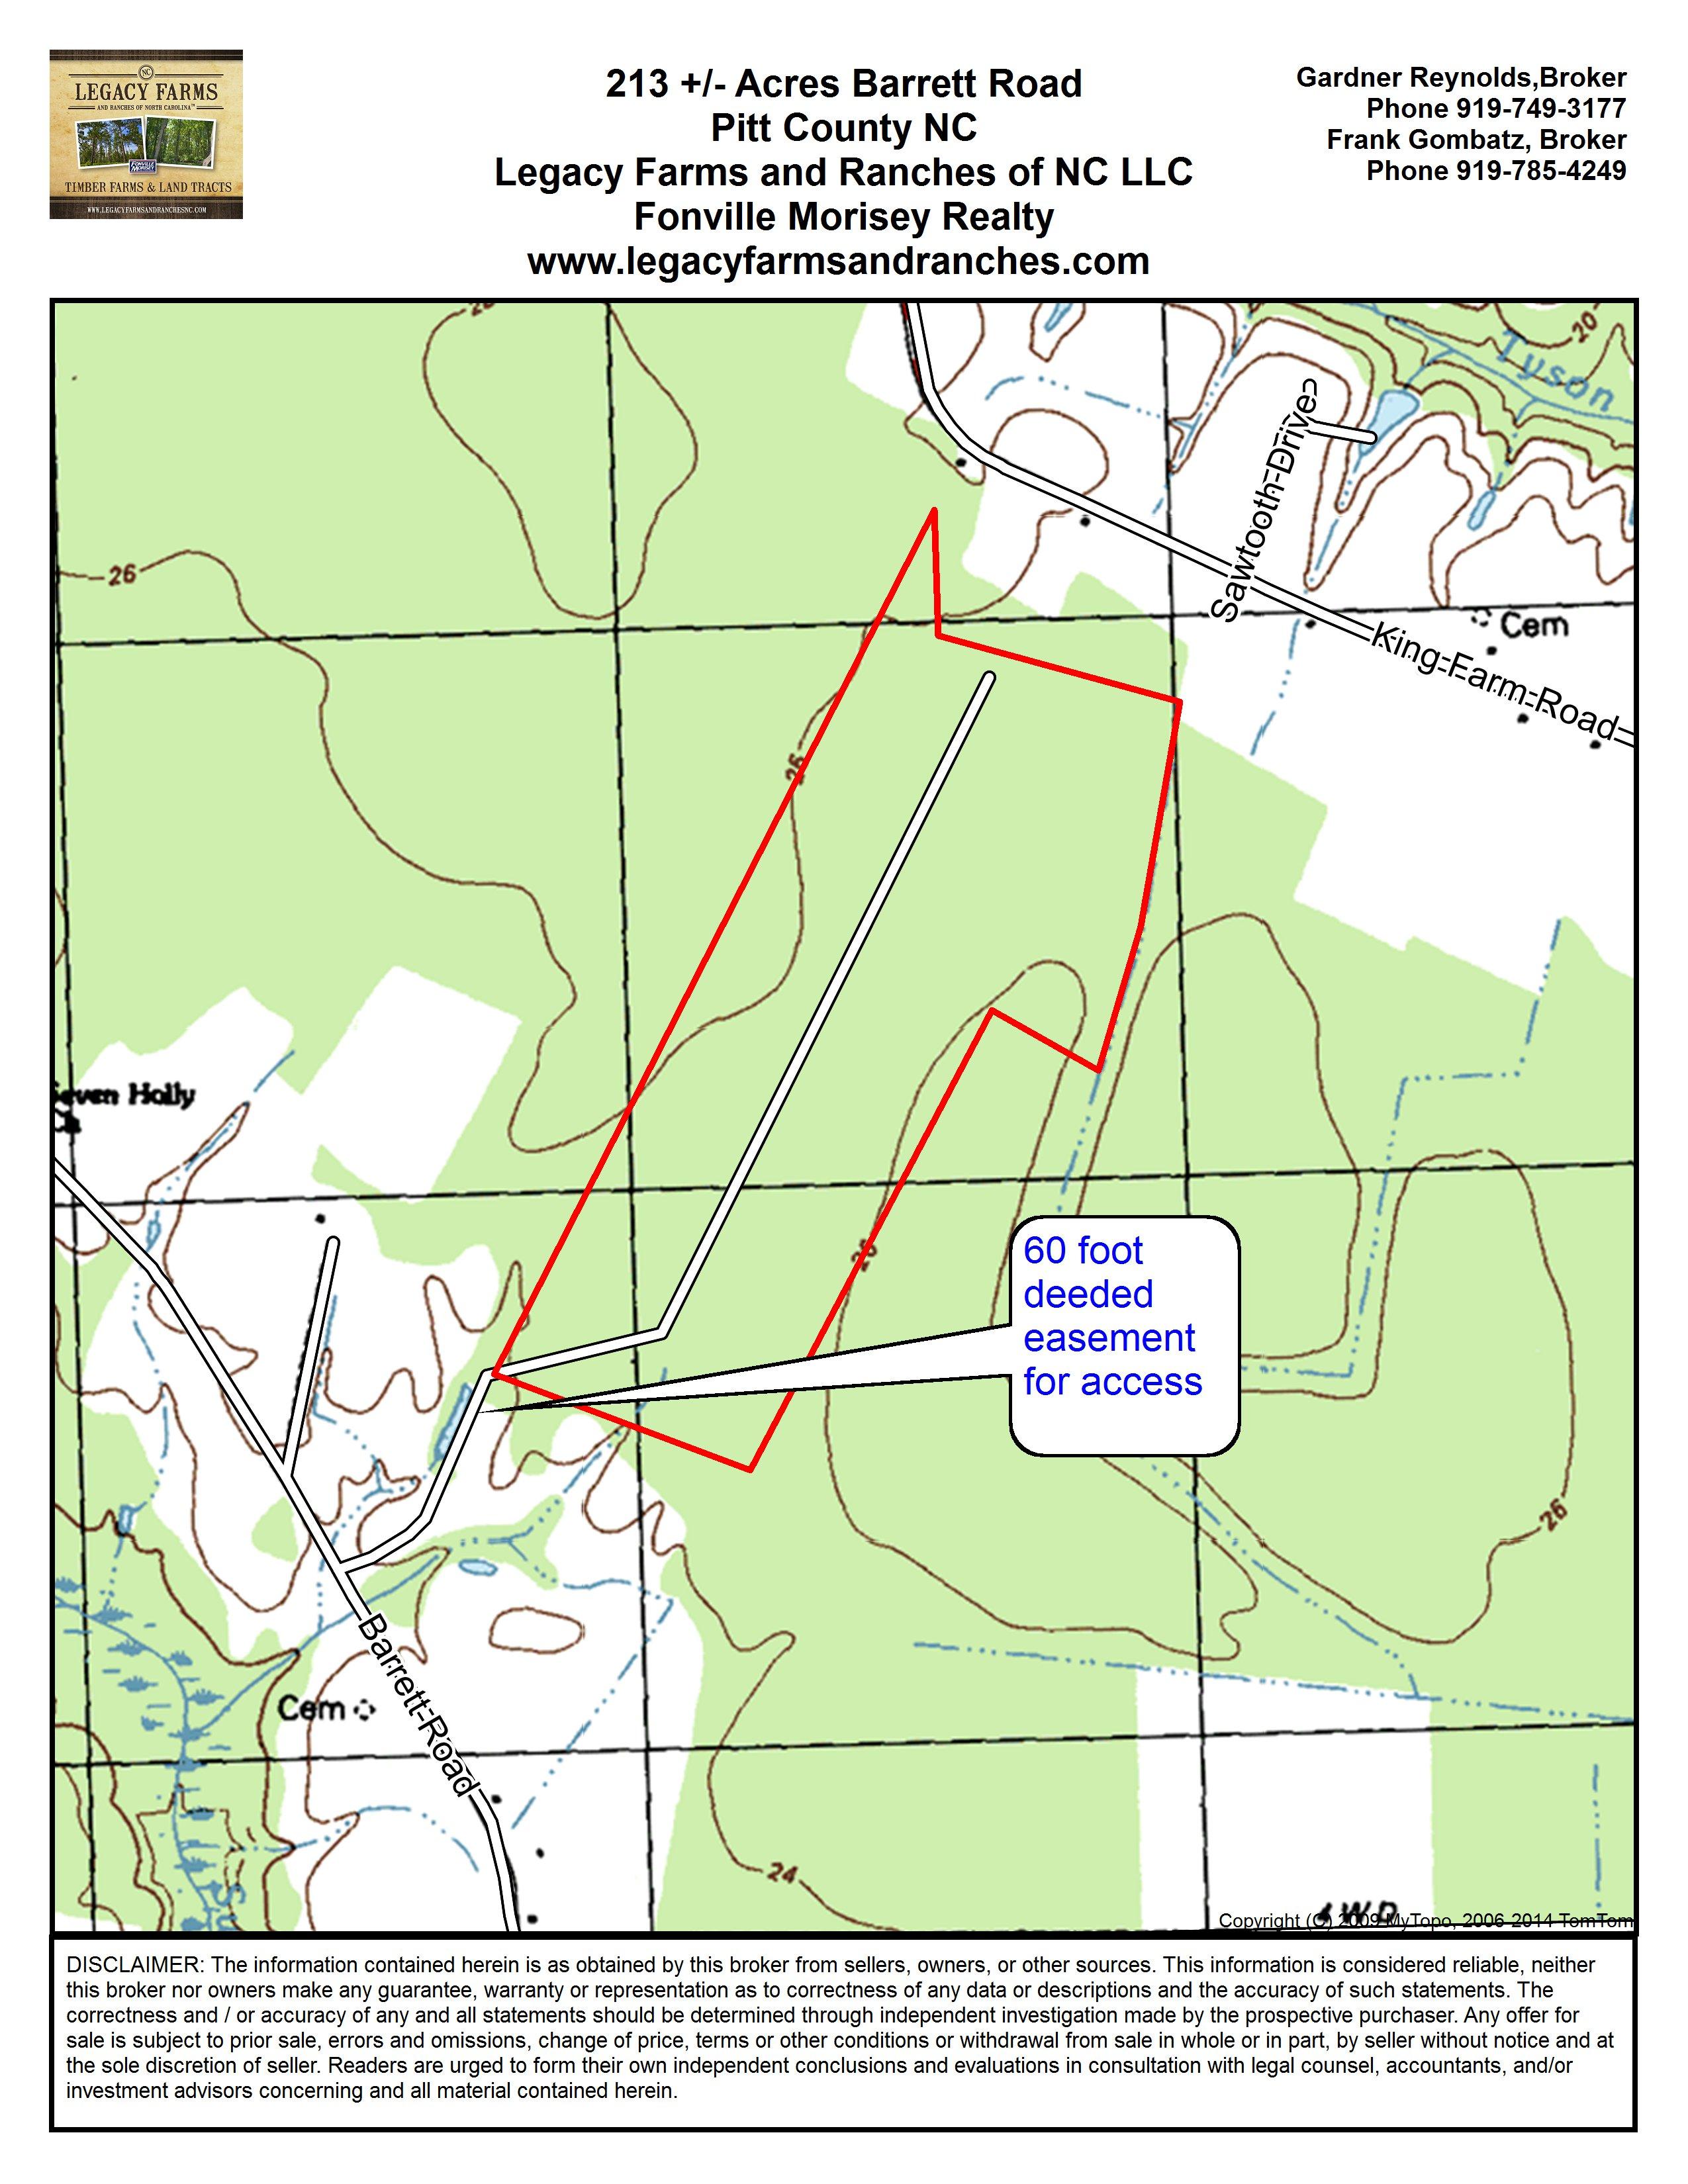 213.8 Acres off Barrett Farm Road in Pitt County NC